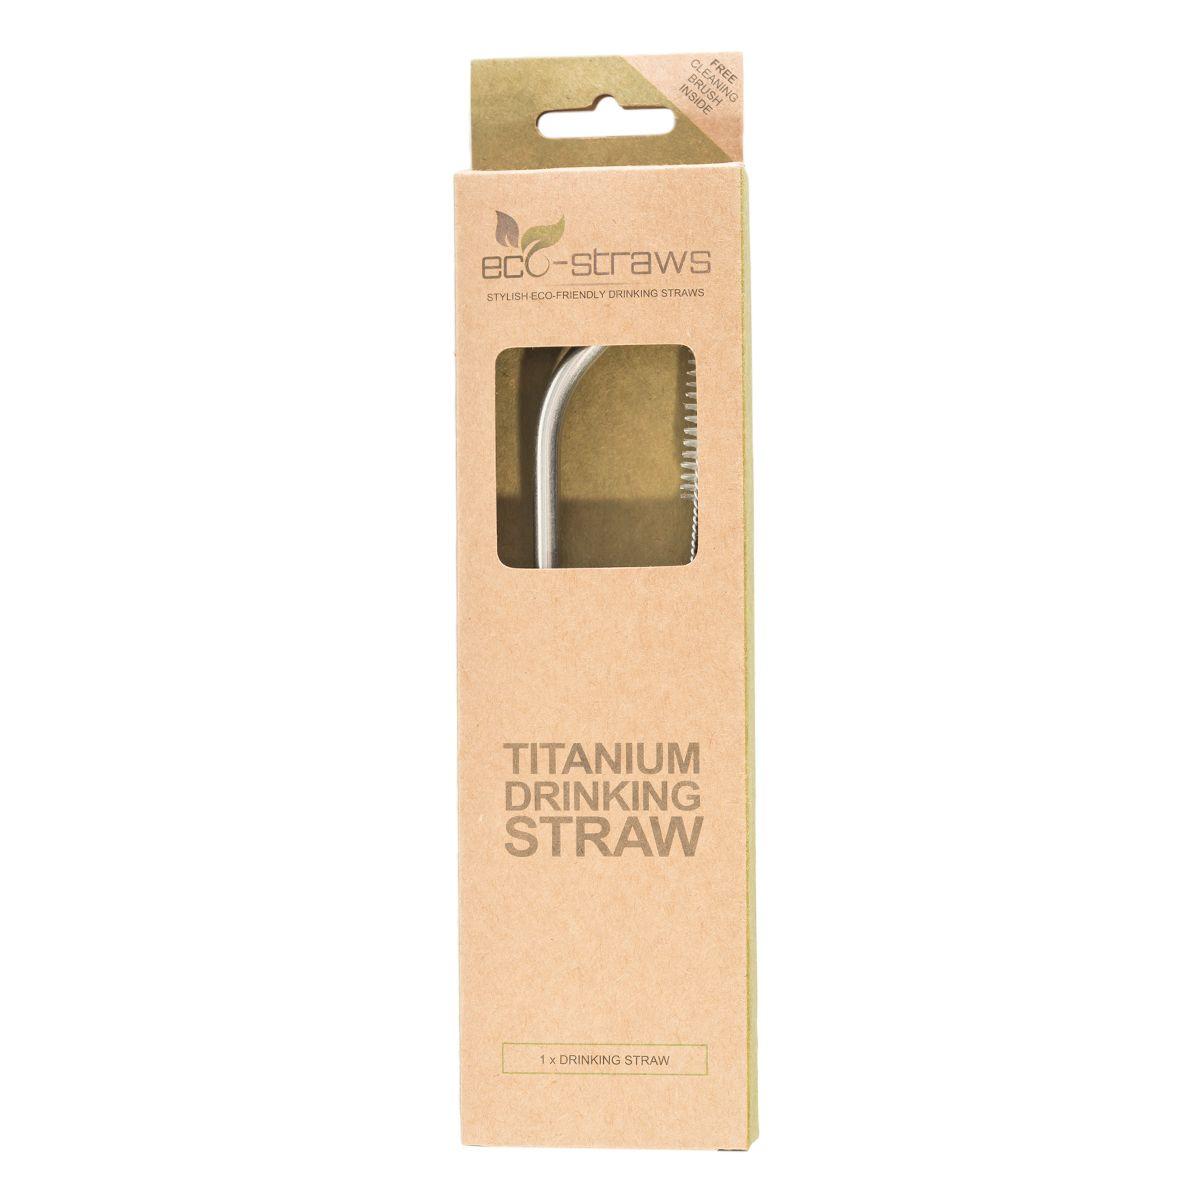 TITANIUM Drinking Straw (ANGLED)